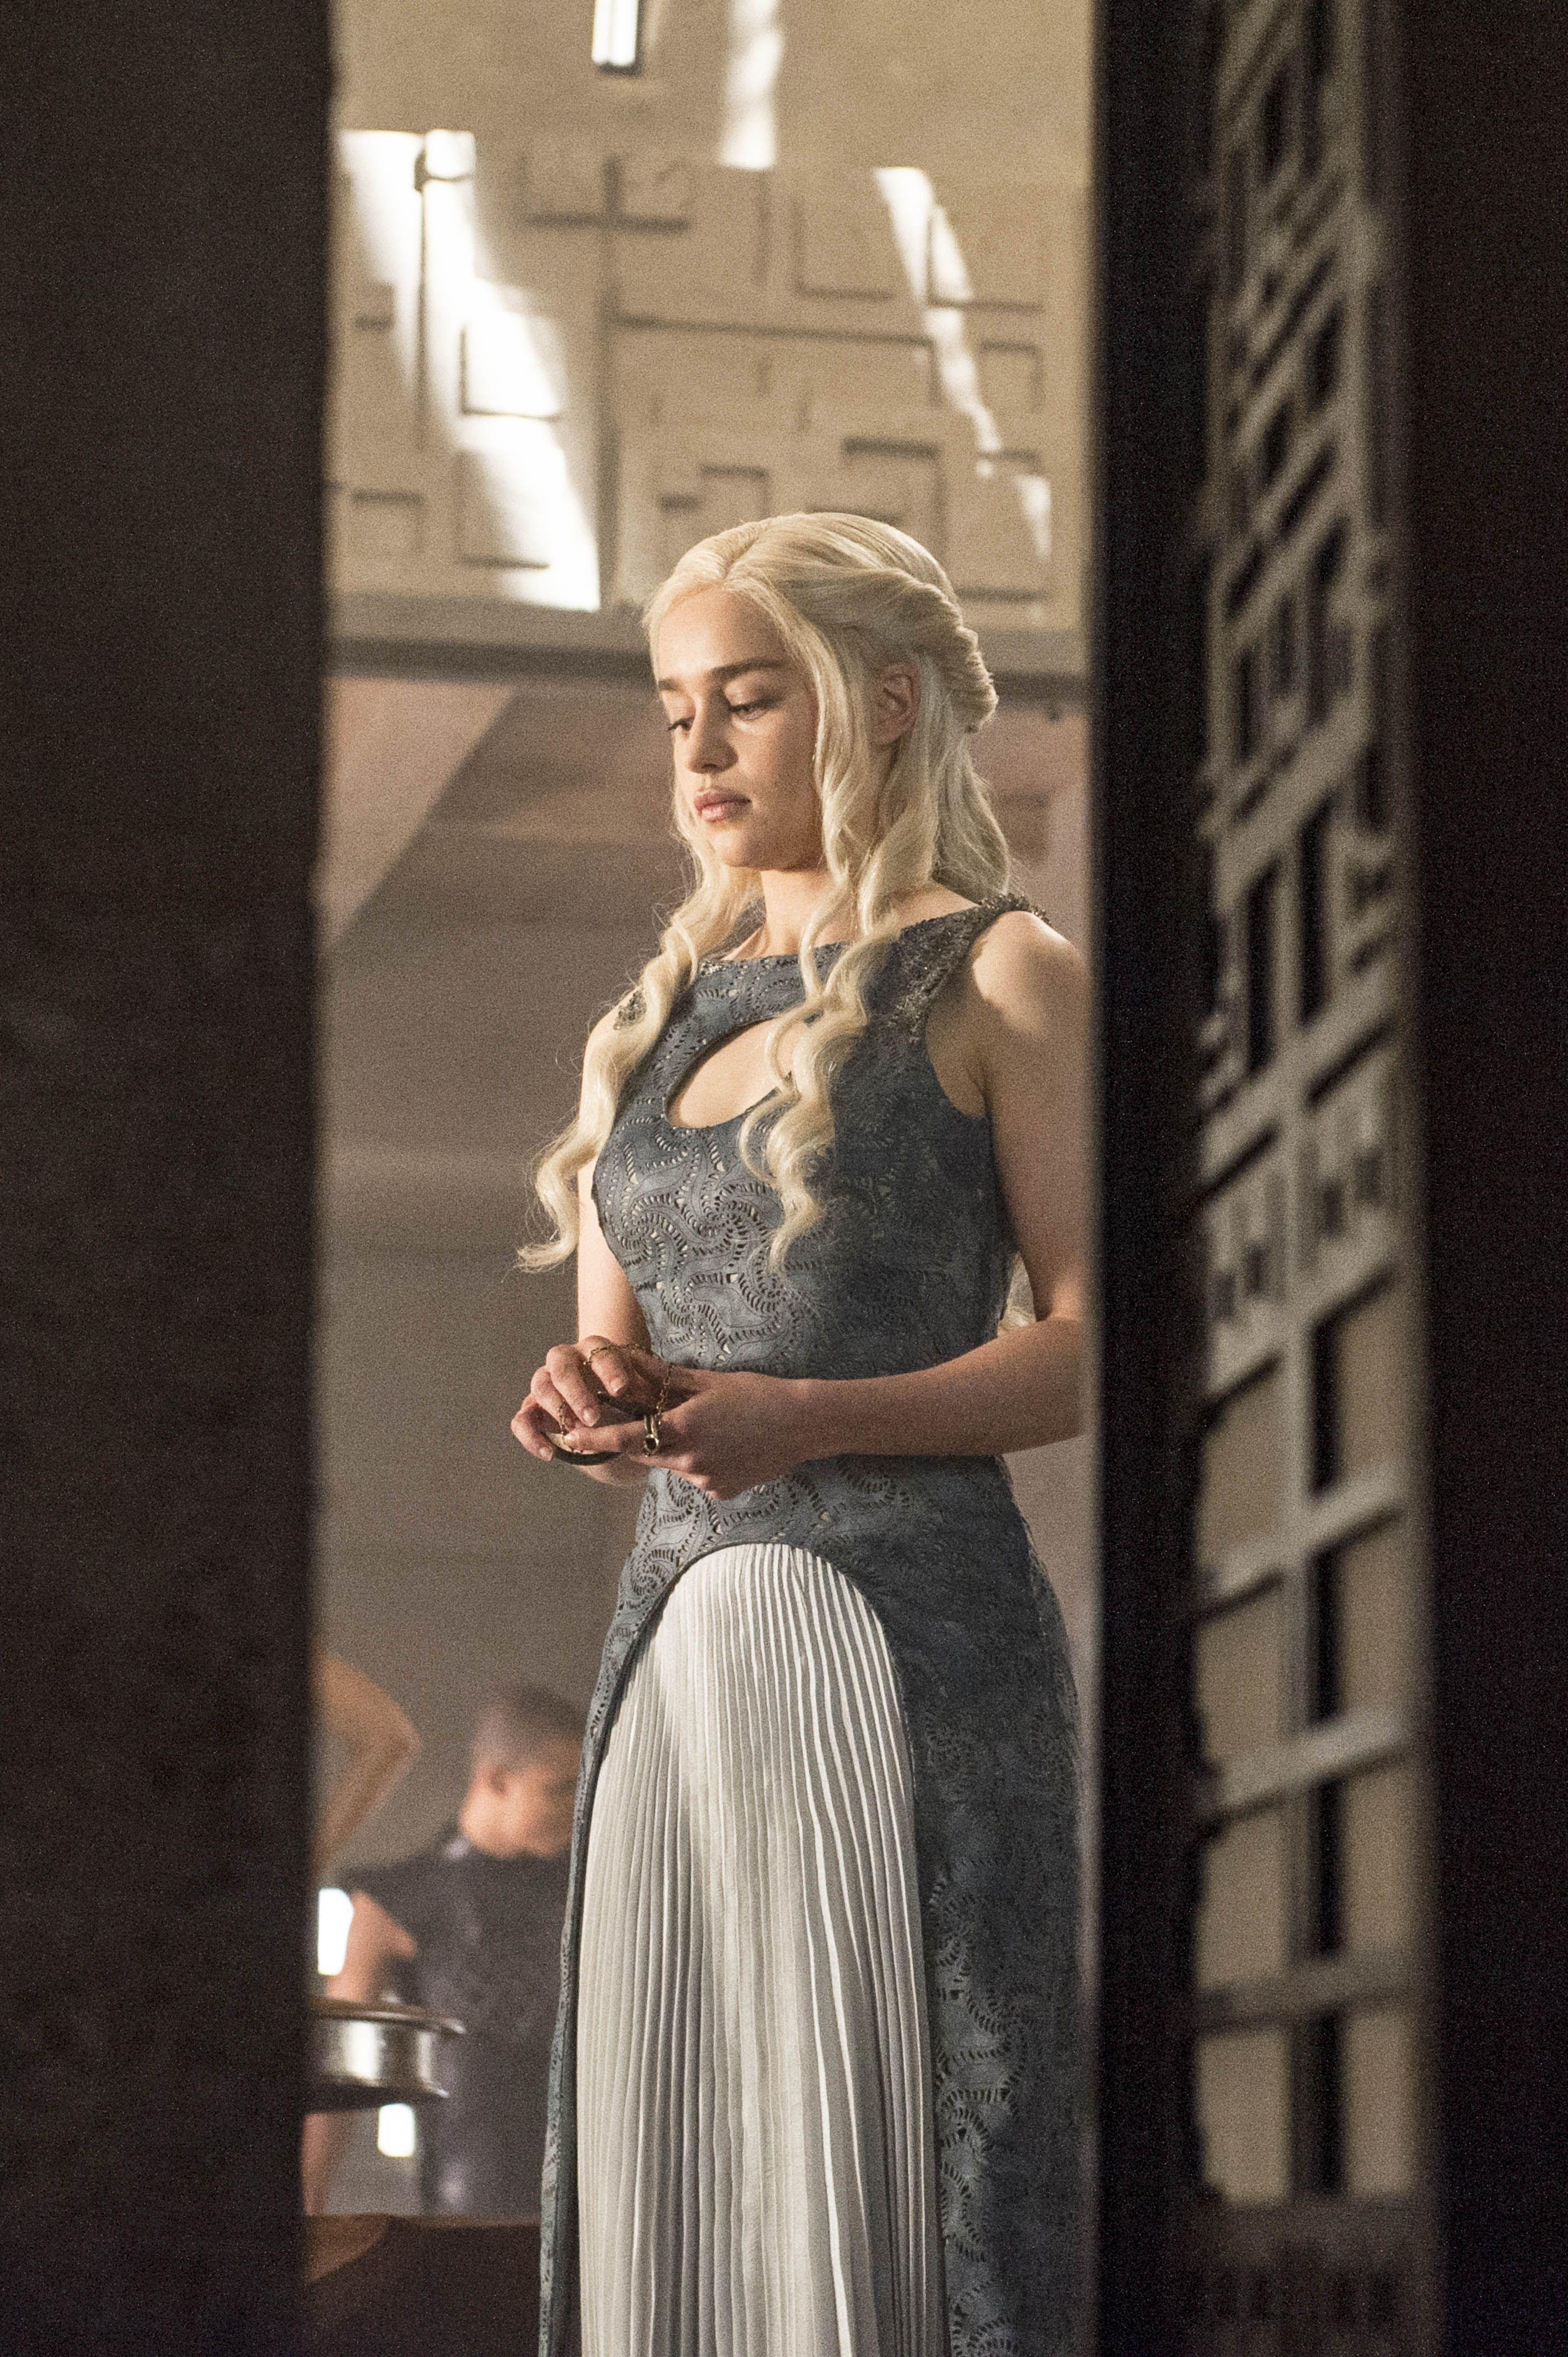 Emilia Clarke as Daenerys Targaryen Game of Thrones